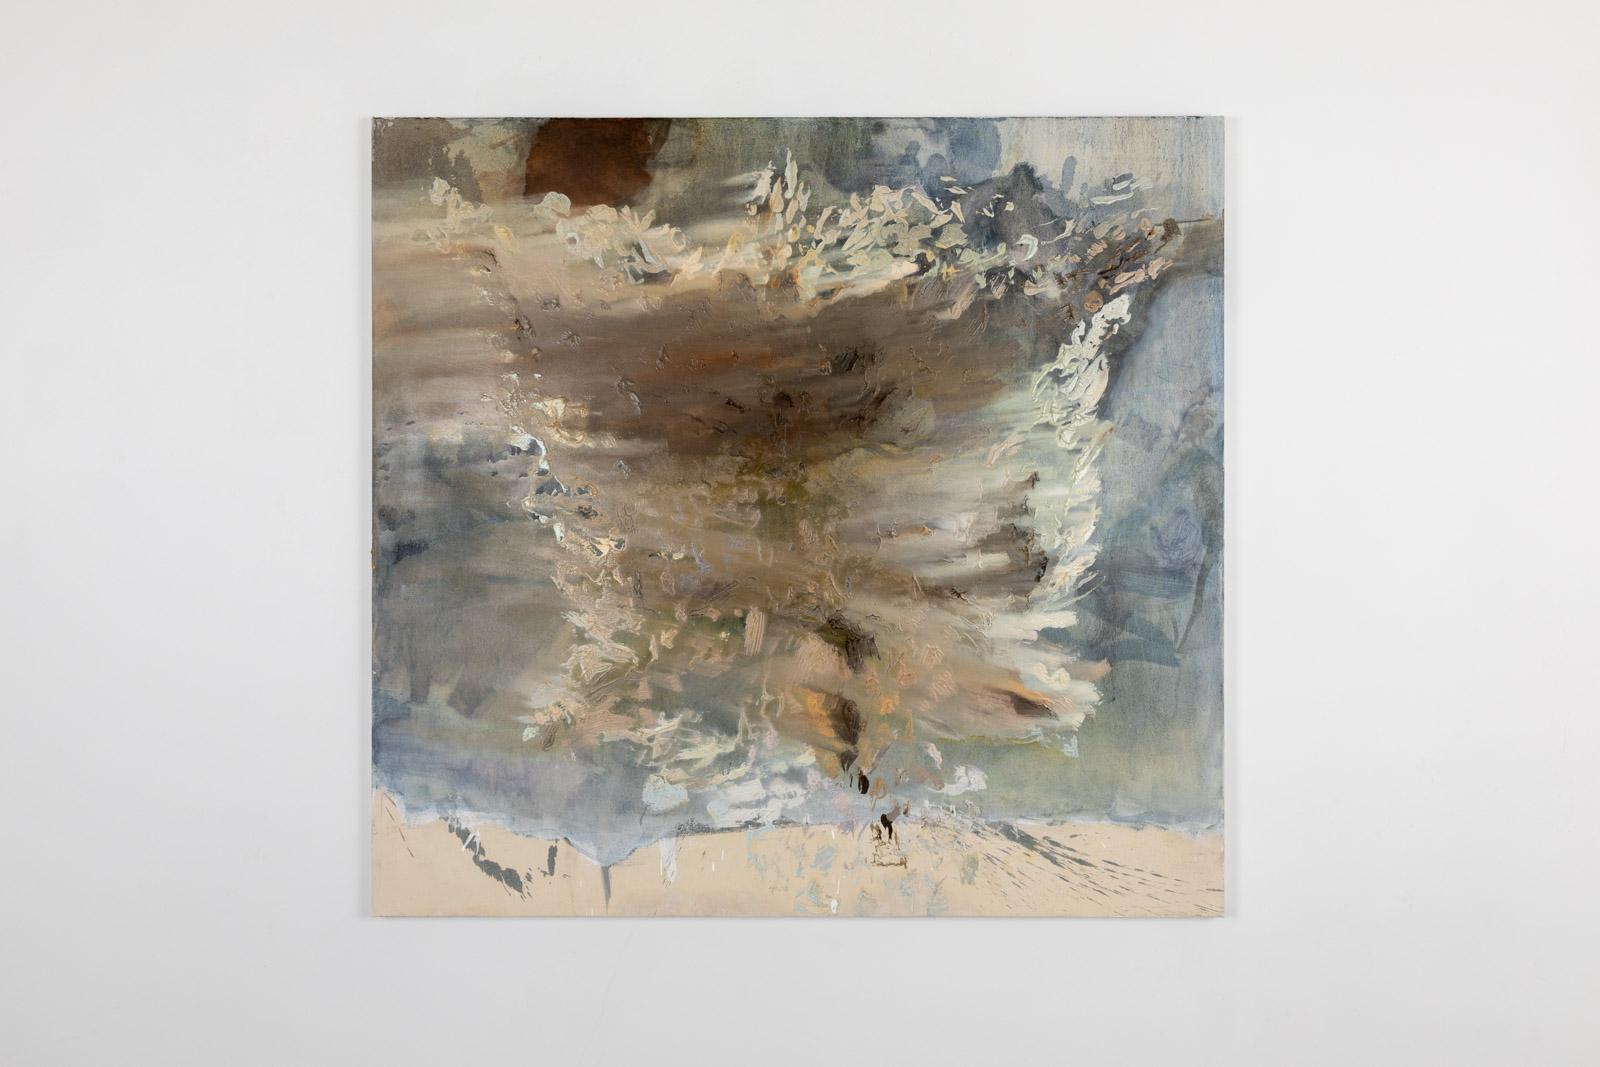 Compass II, 2020, Oil on canvas, 152,4 x 162,5 cm